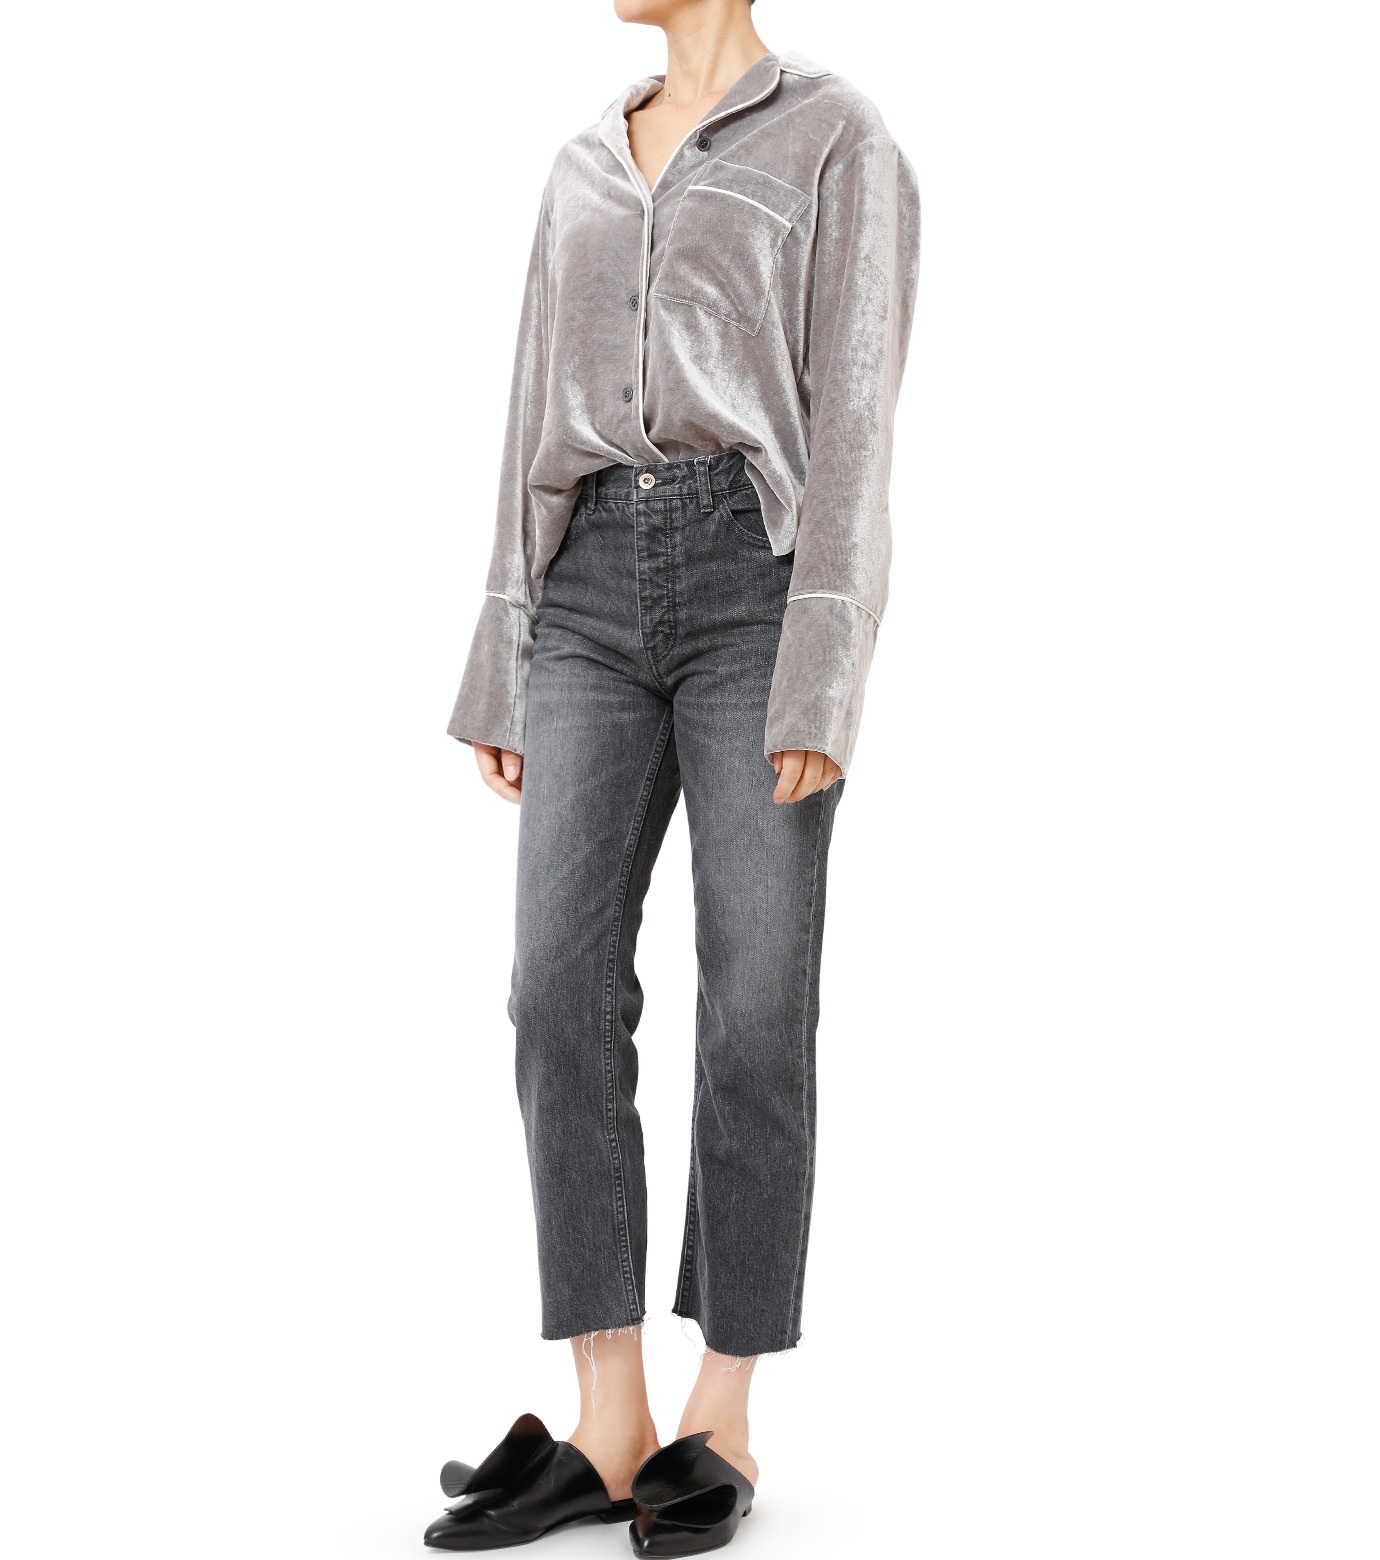 LE CIEL BLEU(ルシェルブルー)のルーズベルベットシャツ-GRAY(シャツ/shirt)-18A63417 拡大詳細画像3